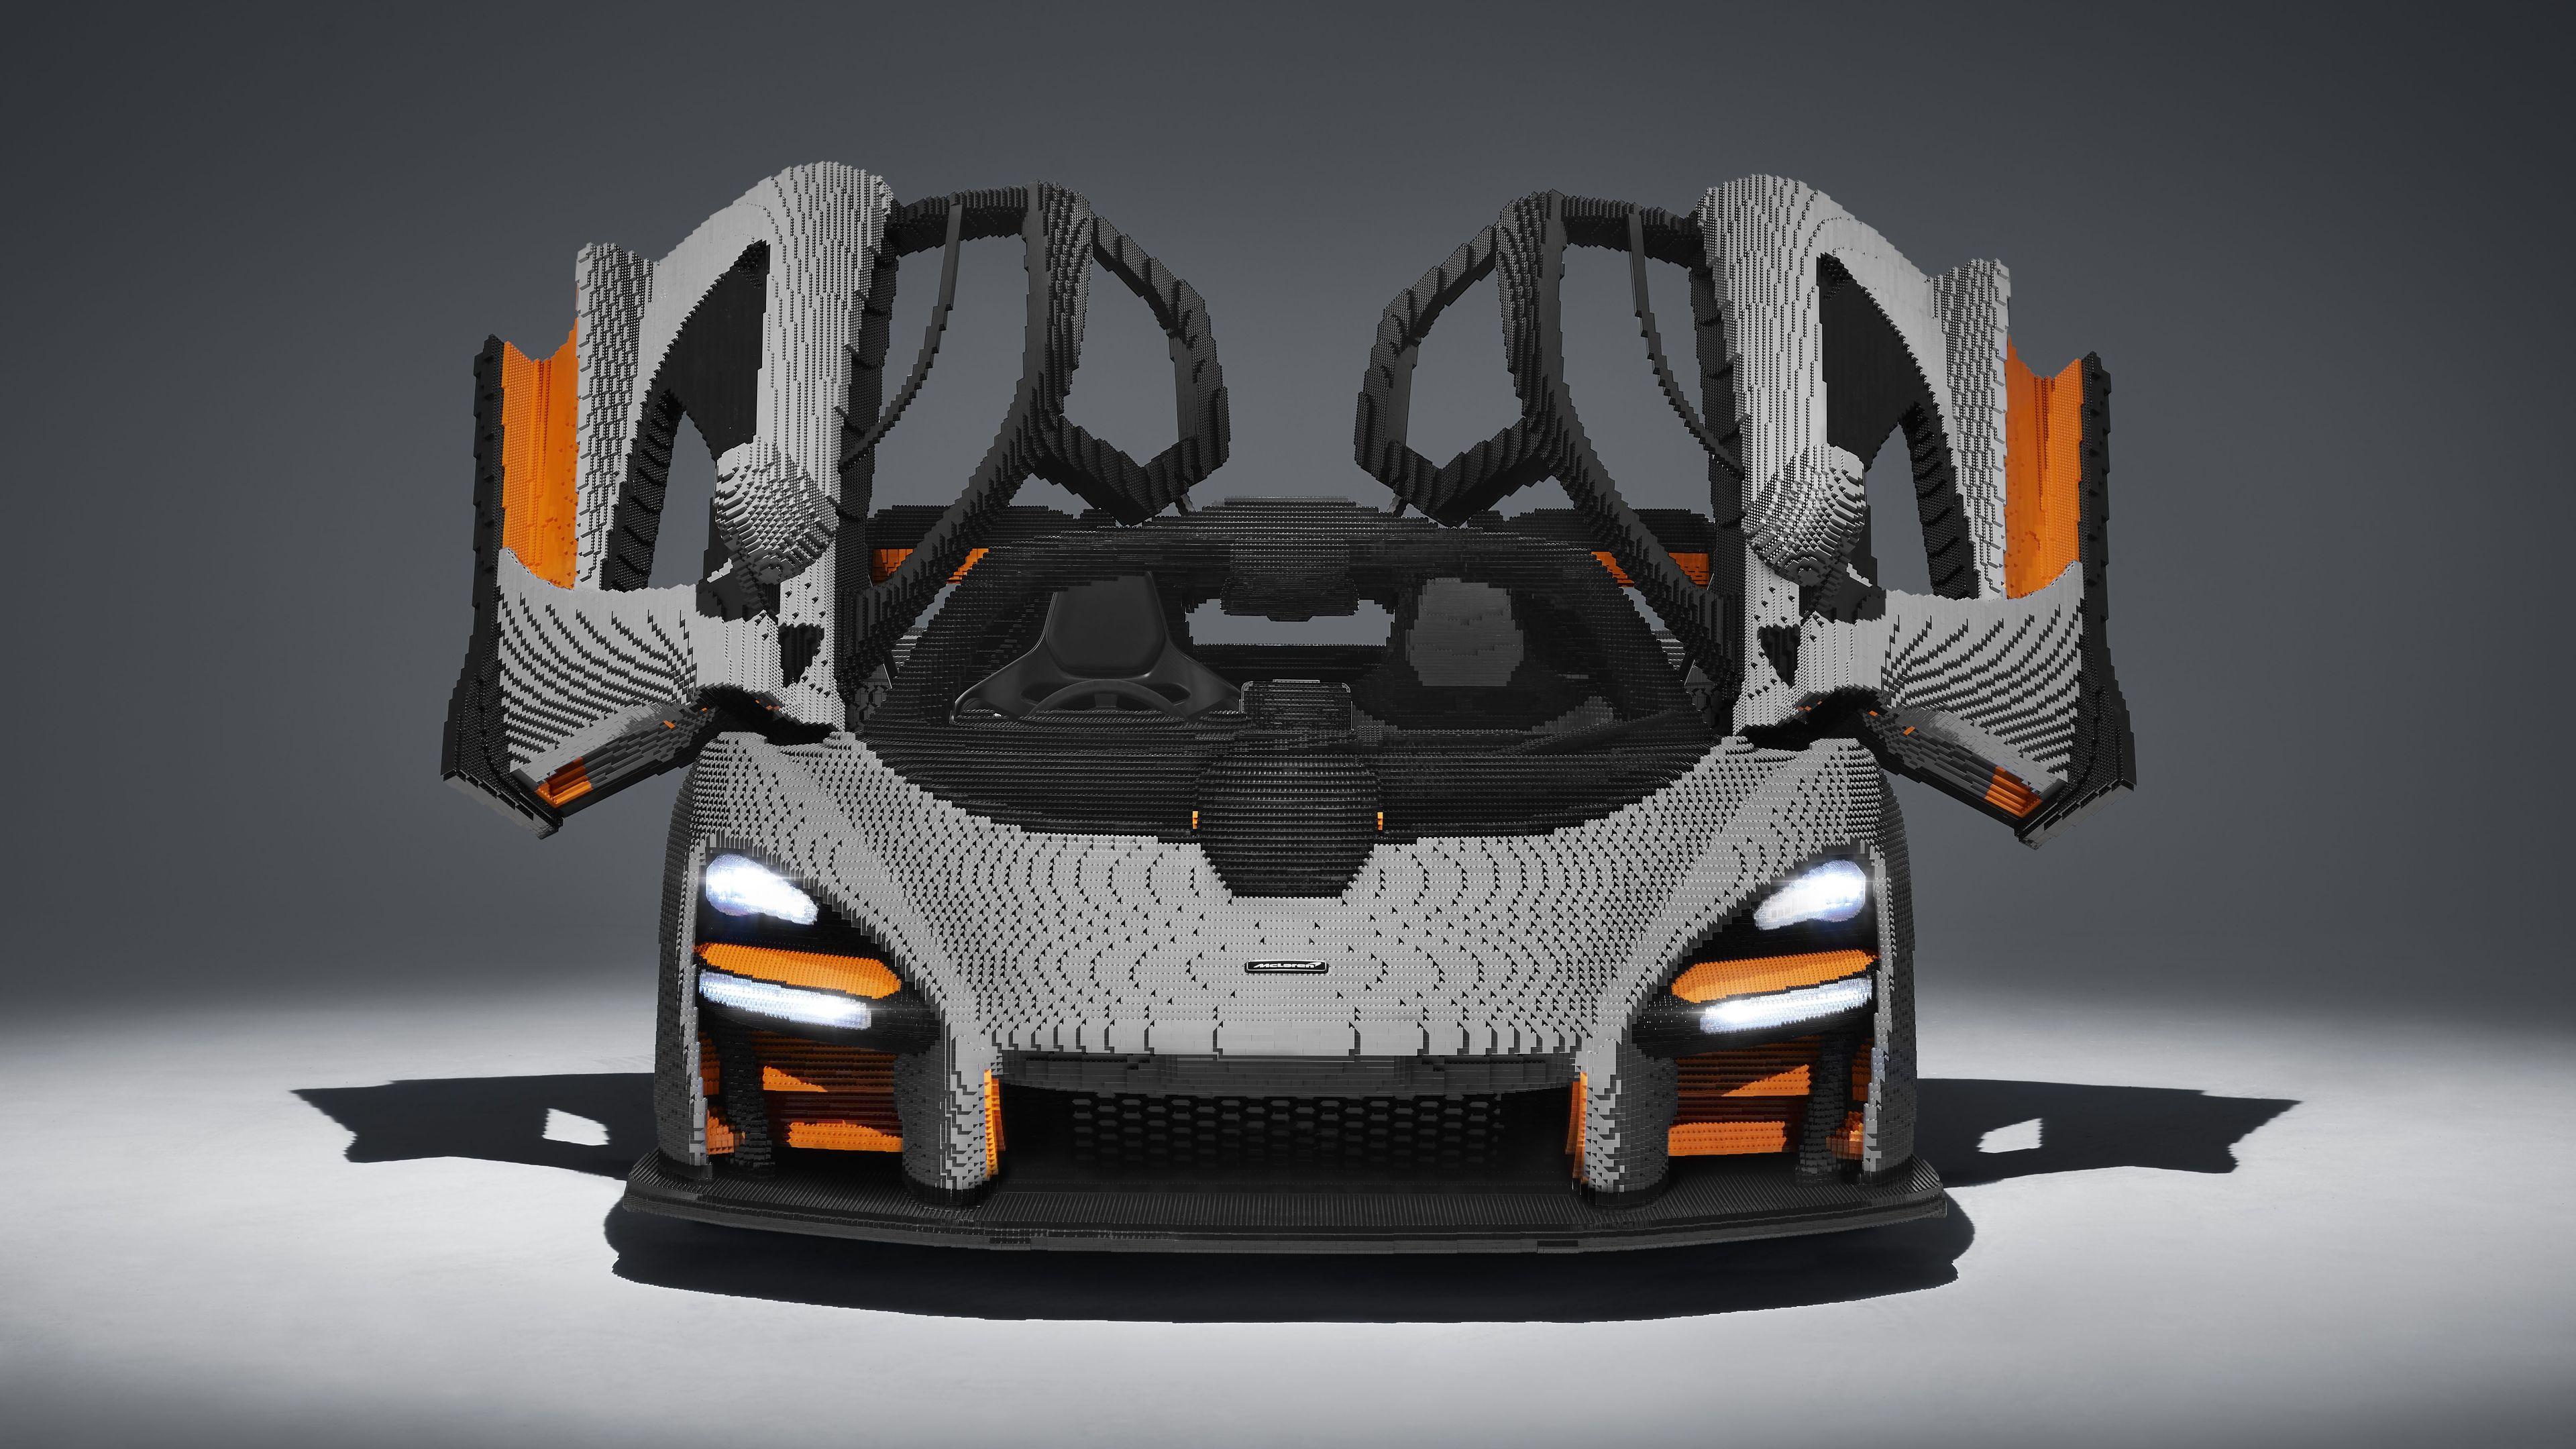 lego mclaren senna 4k 1554245254 - Lego McLaren Senna 4k - mclaren wallpapers, mclaren senna wallpapers, lego wallpapers, hd-wallpapers, cars wallpapers, 5k wallpapers, 4k-wallpapers, 2019 cars wallpapers